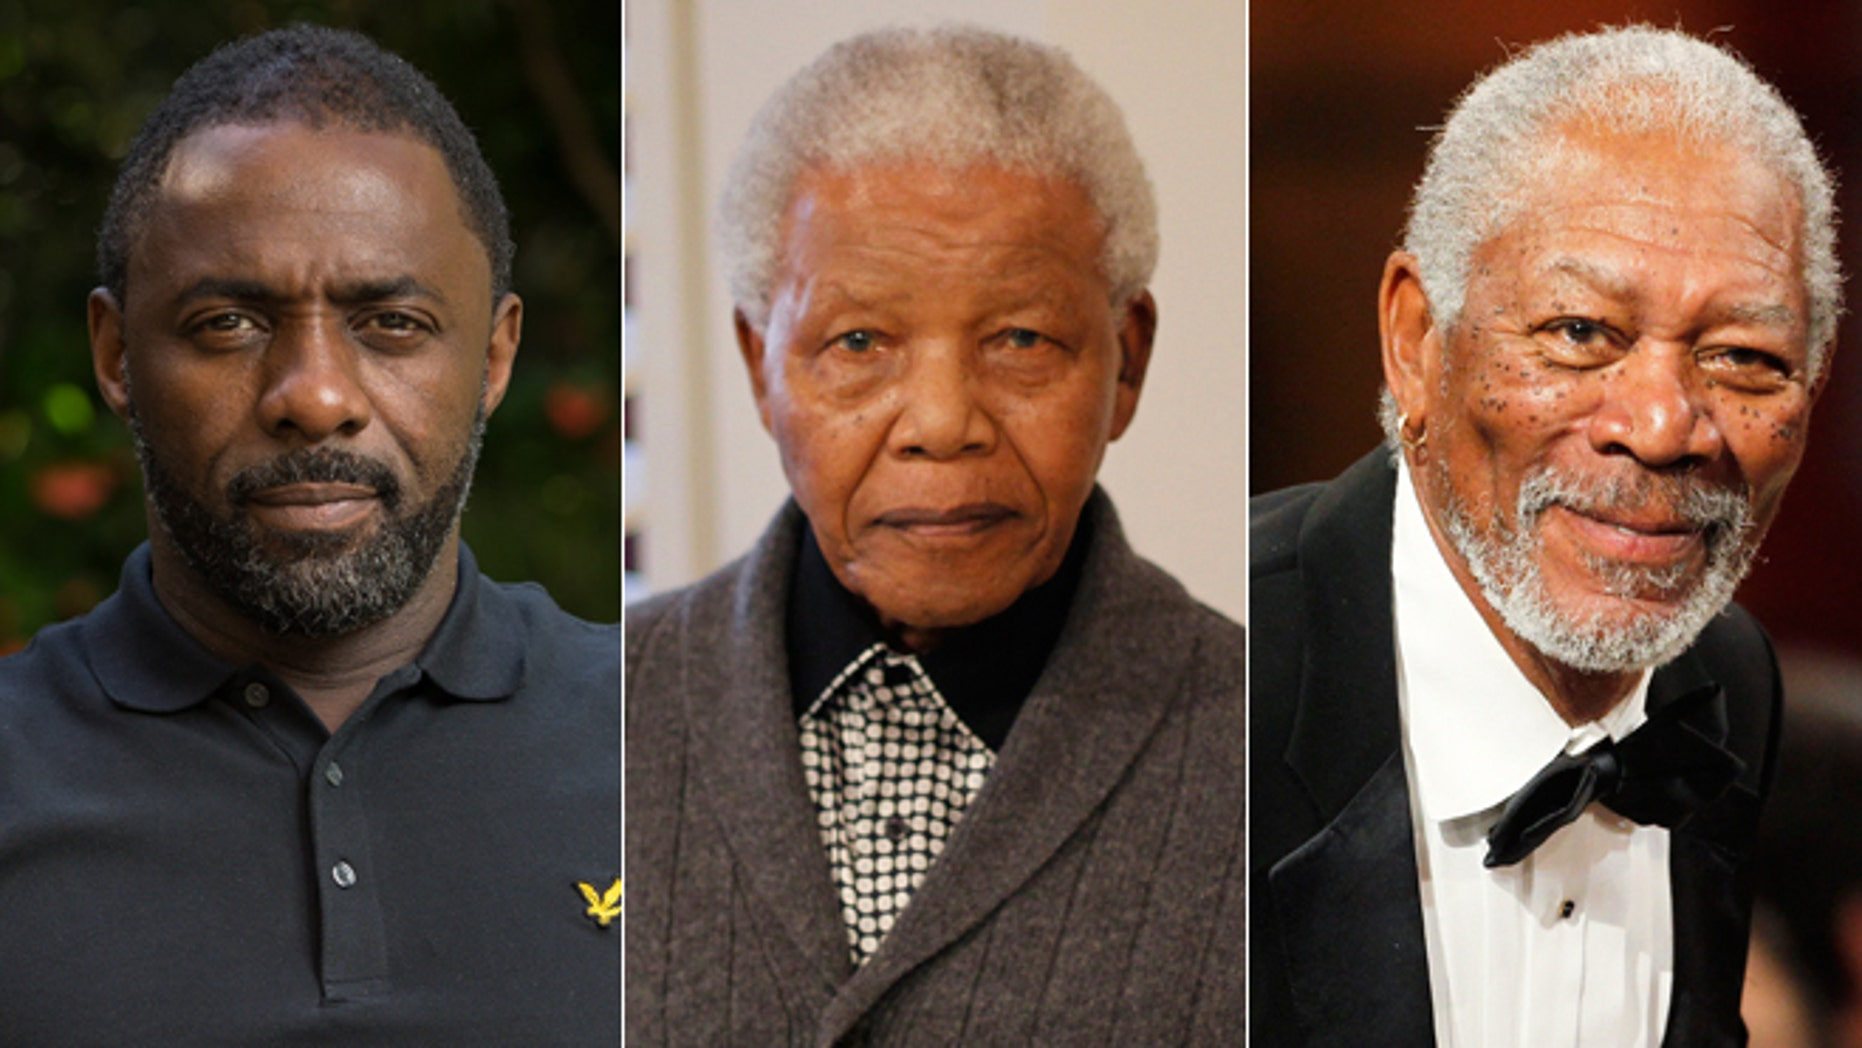 Idris Elba, left, and Morgan Freeman, right, reacted to news of Nelson Mandela's death, center.